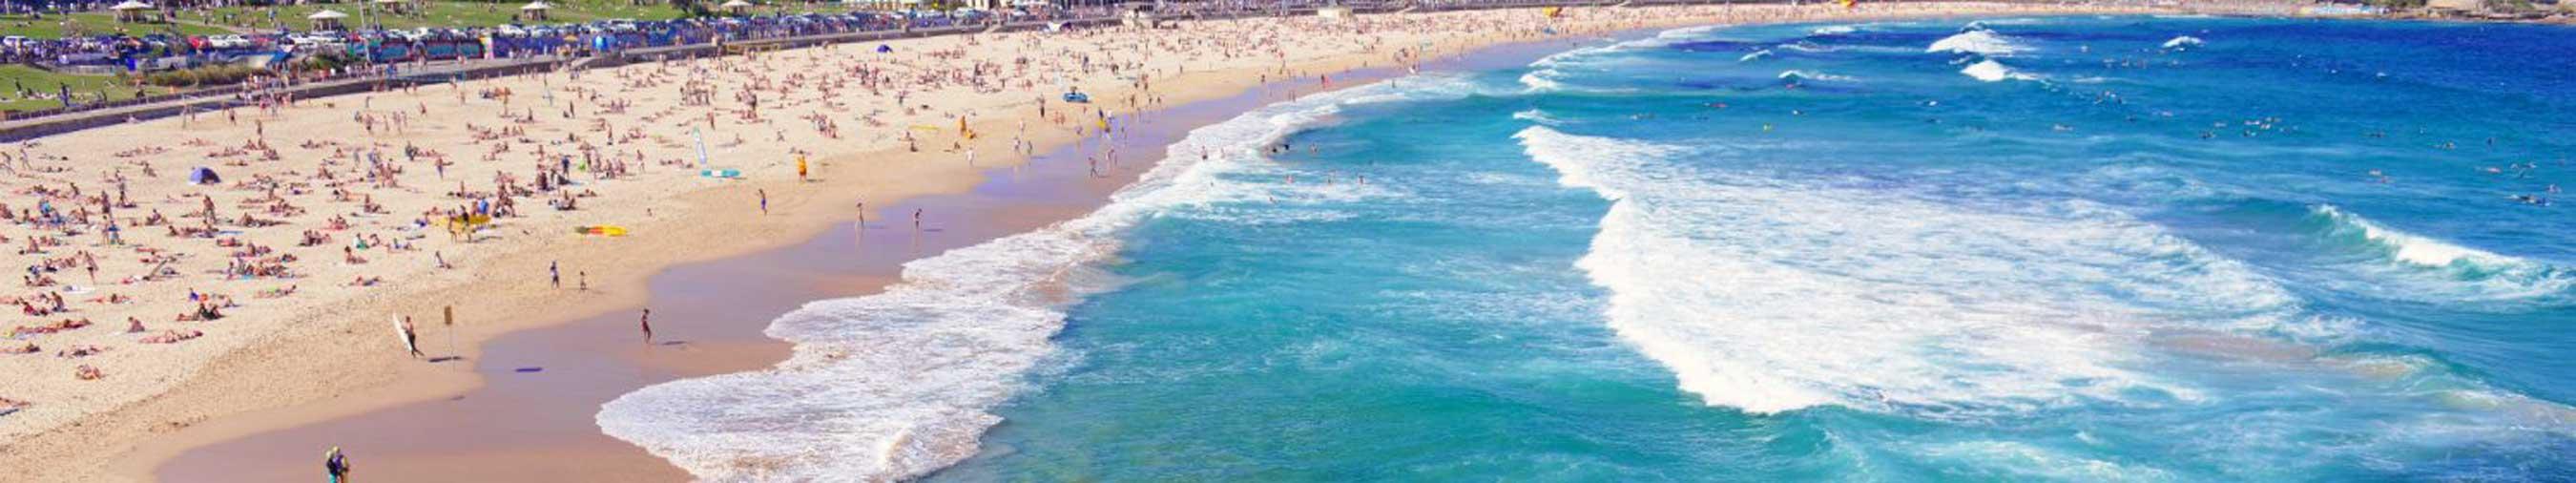 bondi-beach sydney australia banner